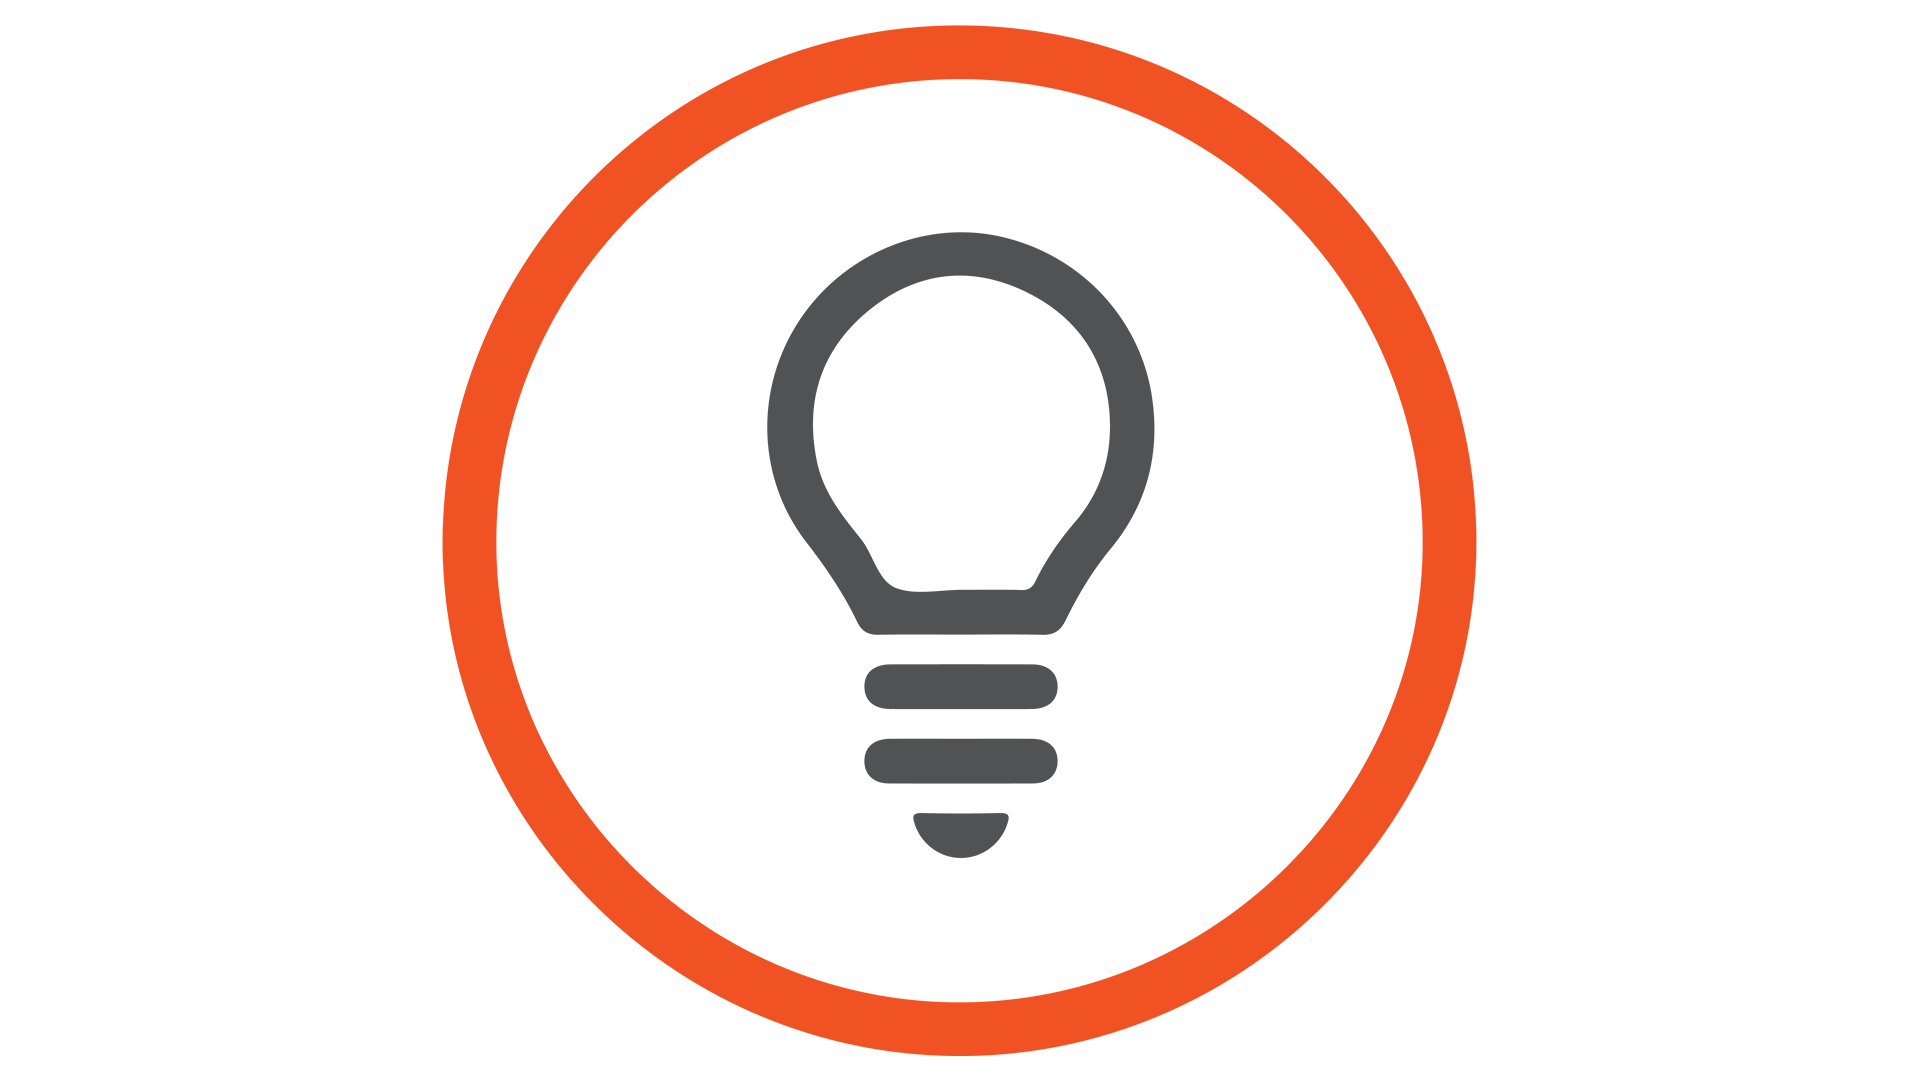 Electrical Utilities_Symbols (1080p)